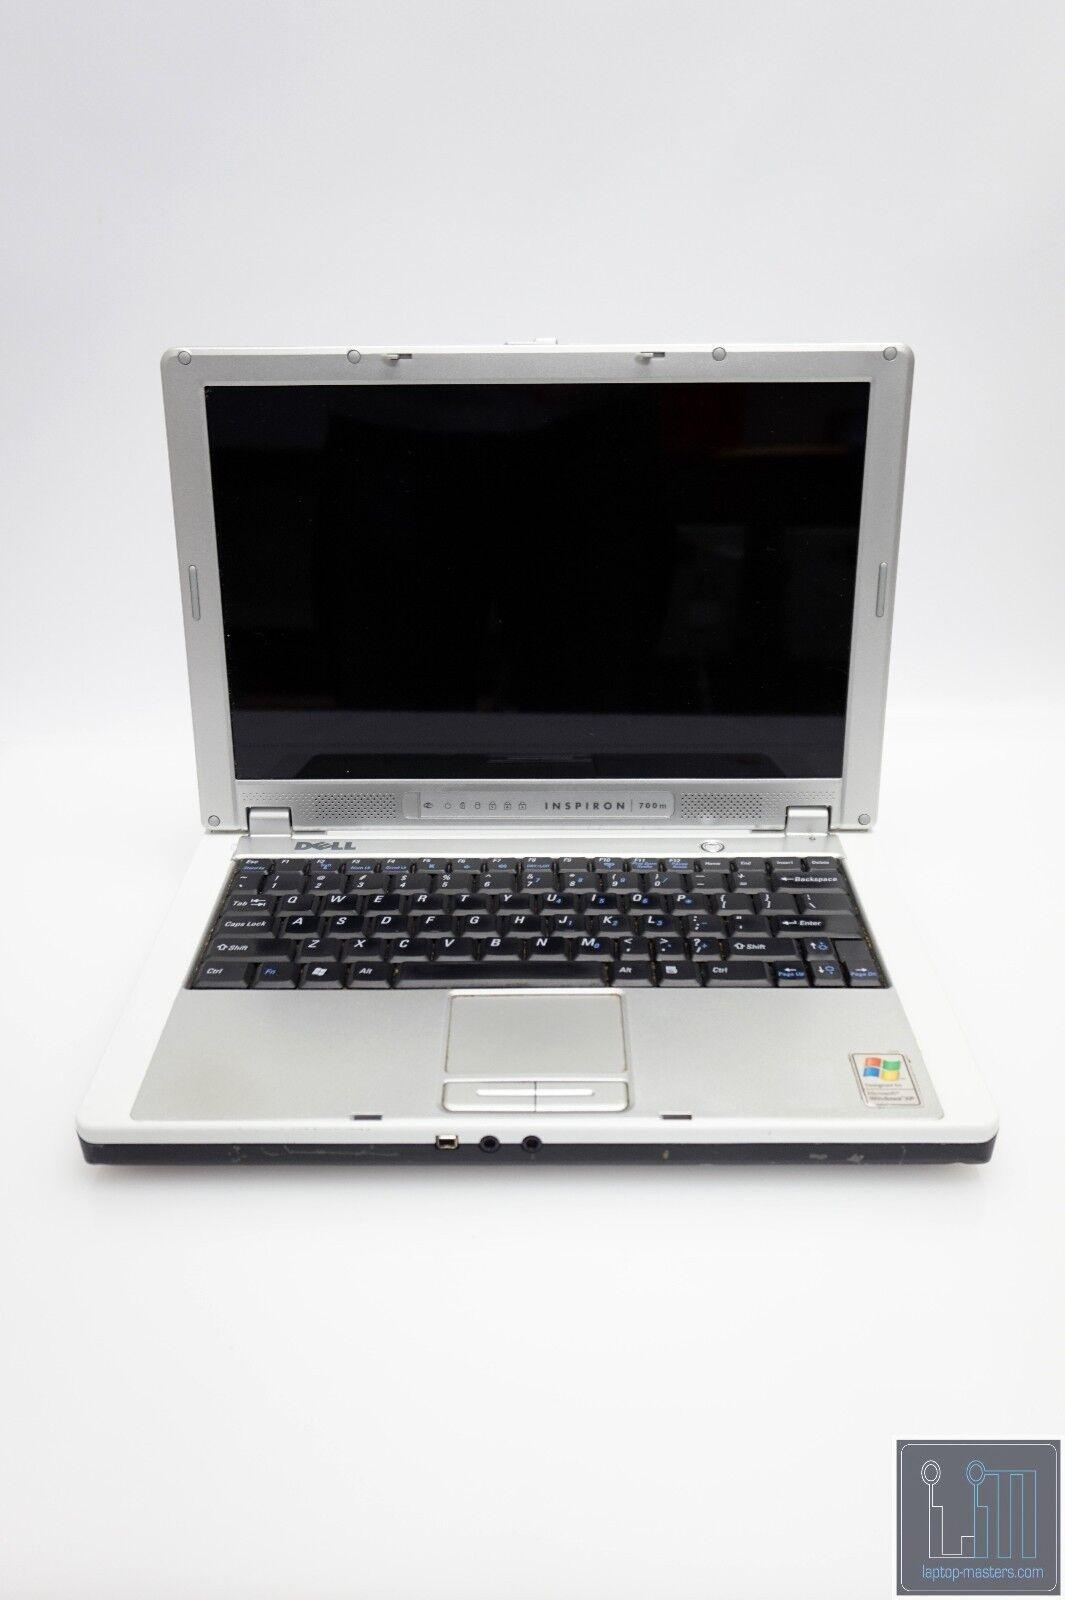 "Dell Inspiron 700m 12.1"" Intel Pentium M Laptop No RAM No HD No Battery AS IS"